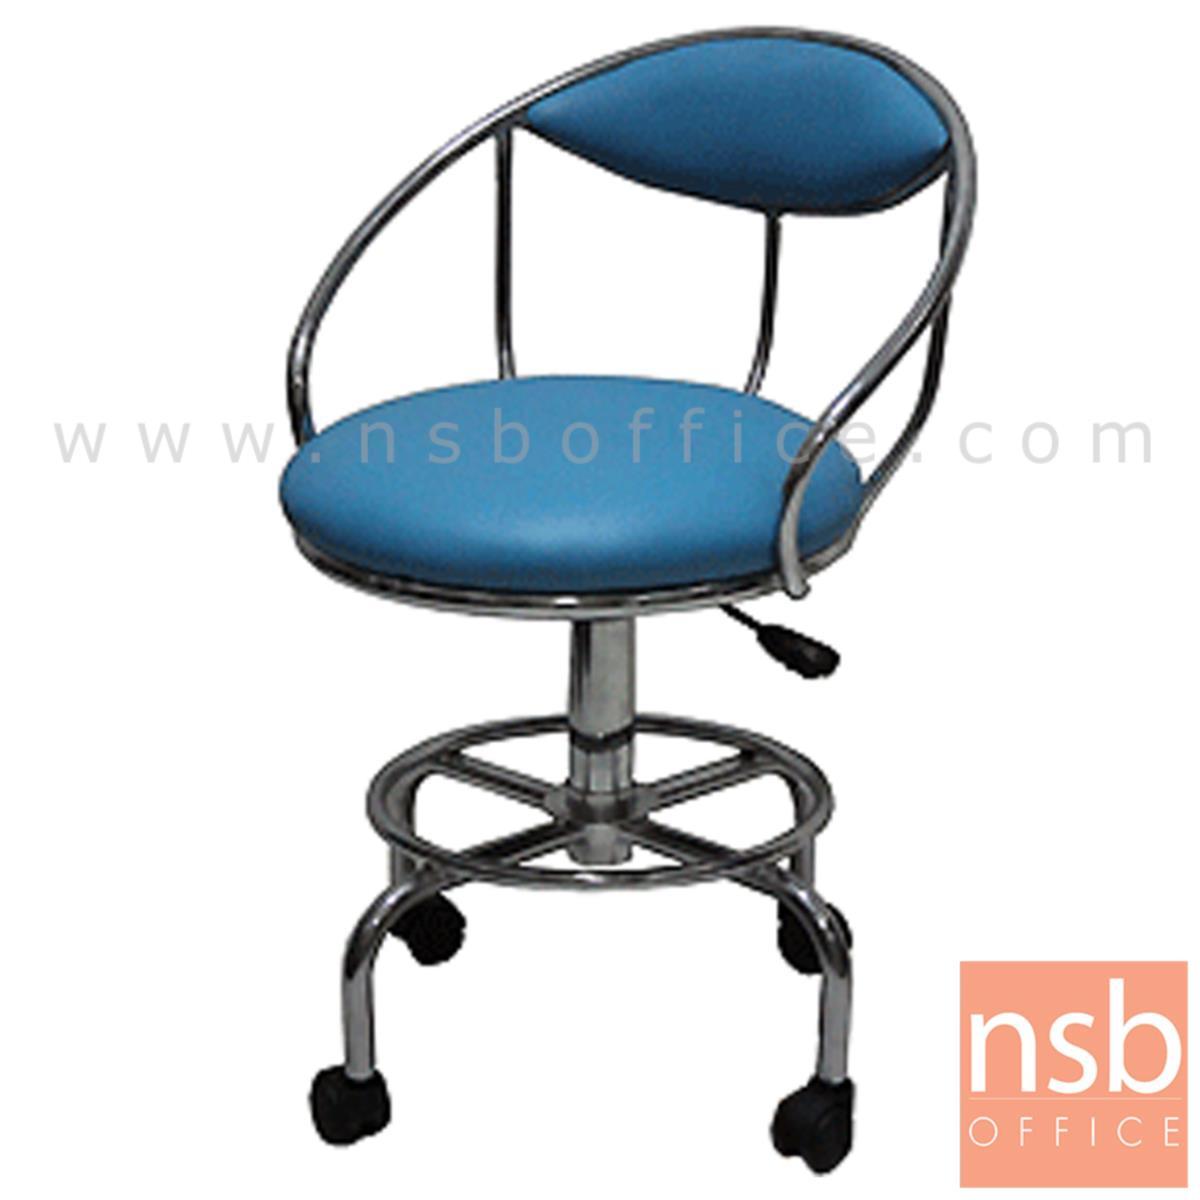 B09A105:เก้าอี้บาร์ที่นั่งกลมล้อเลื่อน รุ่น Quincey (ควินซี่)  โช๊คแก๊ส ขาเหล็กชุบโครเมี่ยม